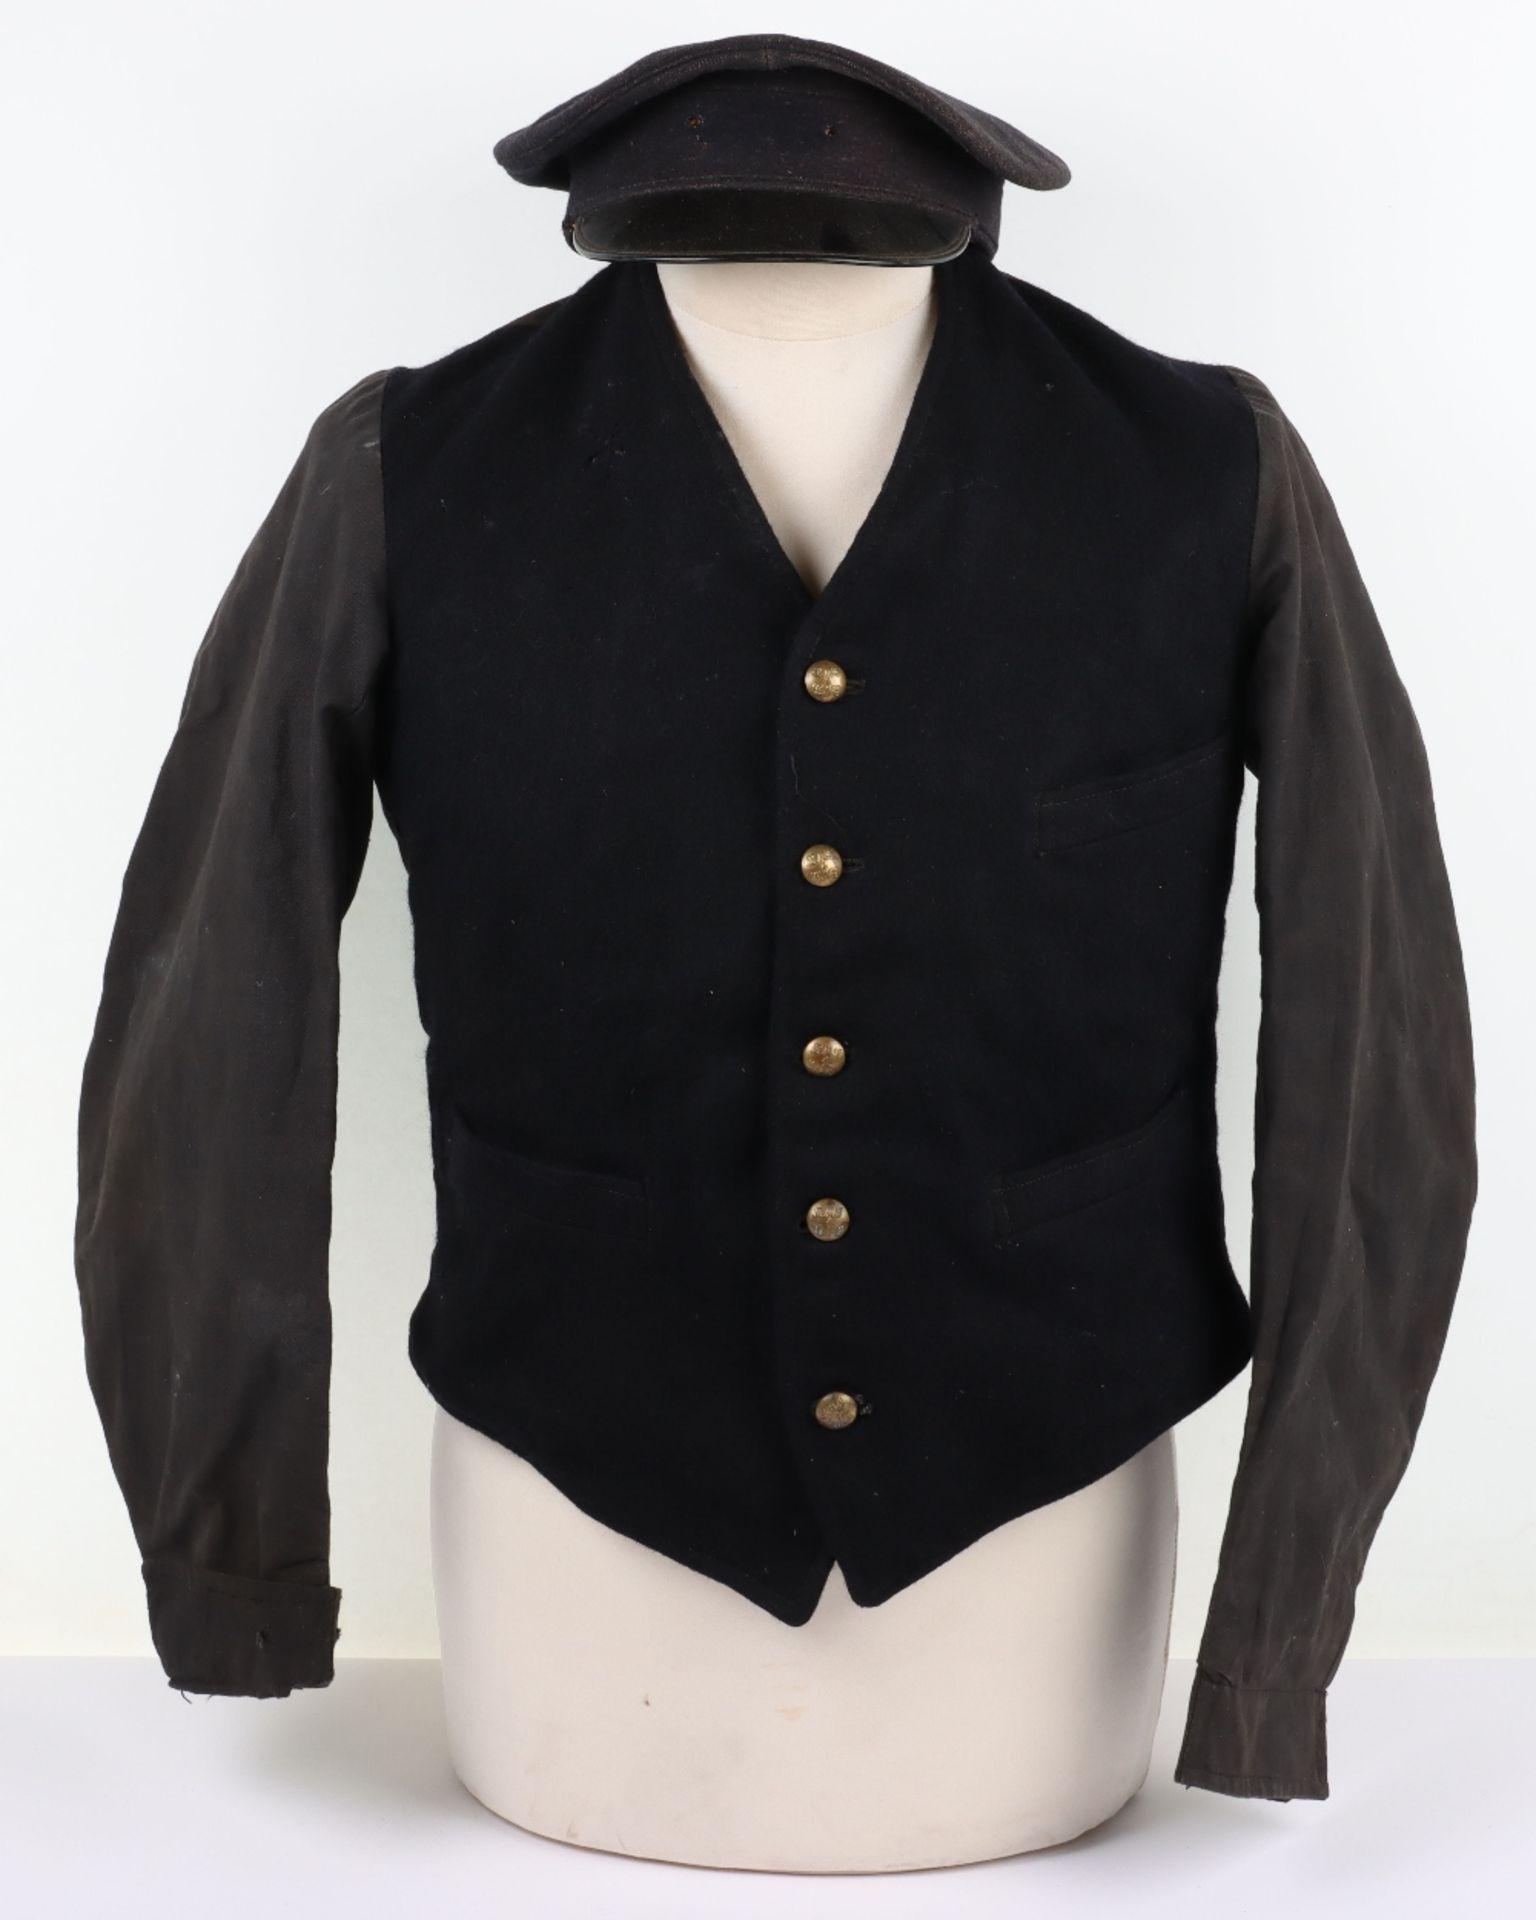 A London, Midland & Scottish and London North Eastern Railway porter's jacket, circa 1930